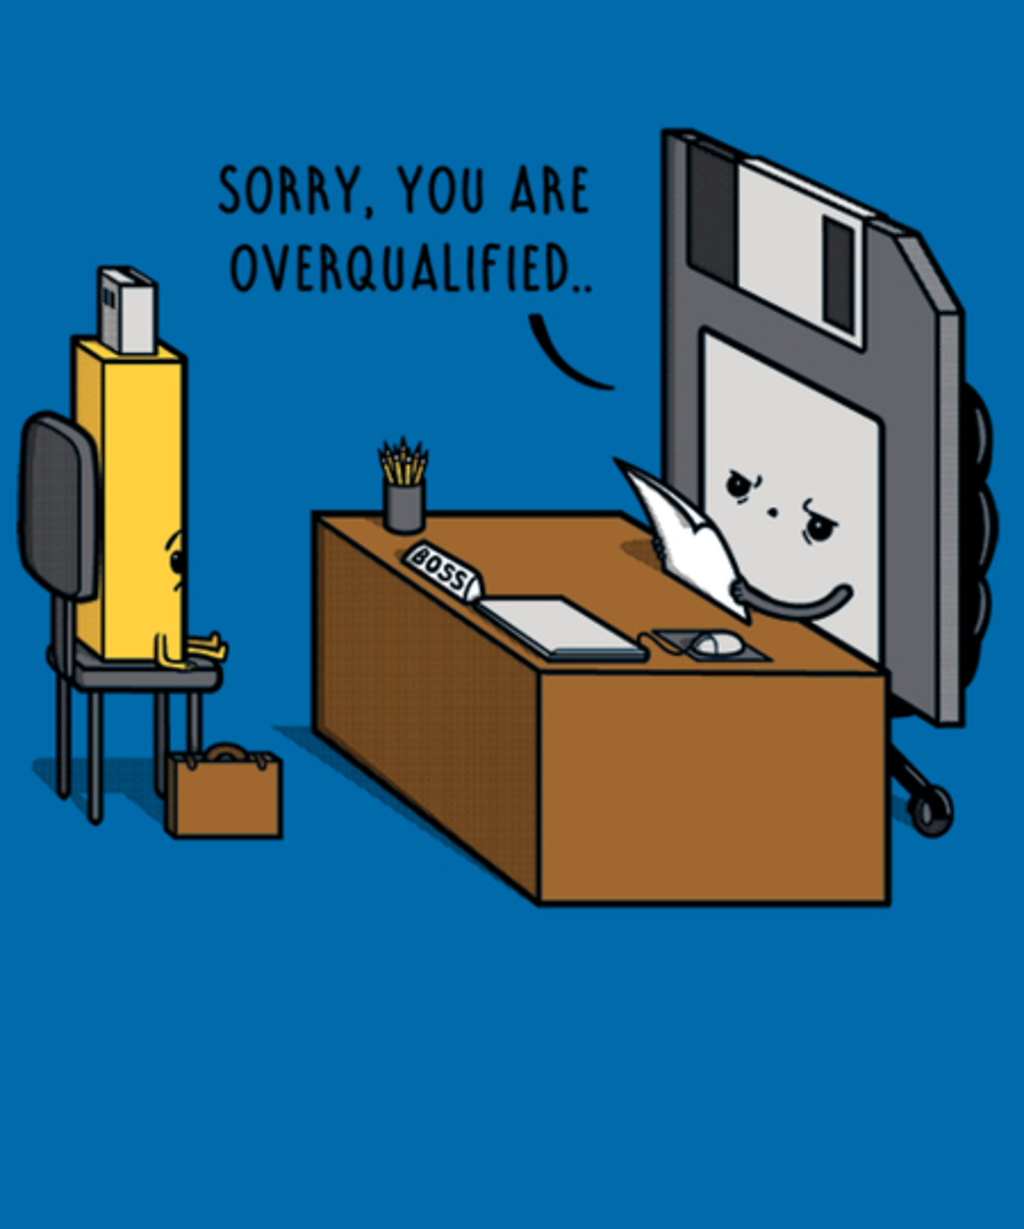 Qwertee: Overqualified!